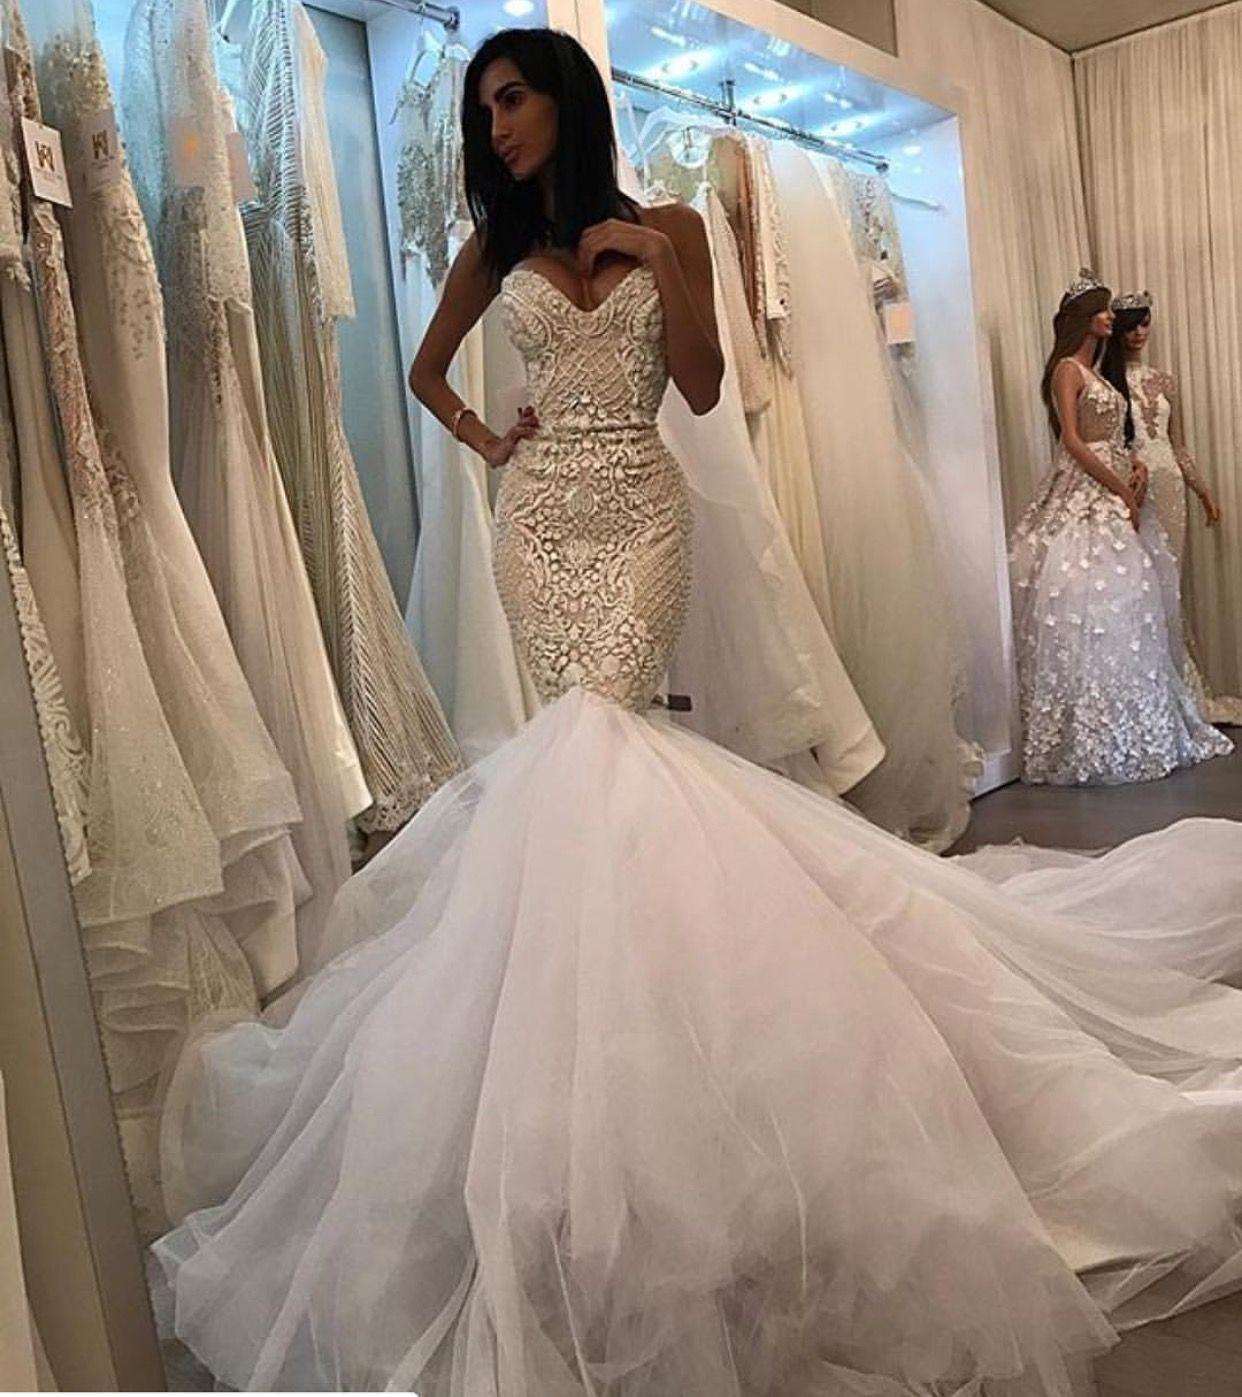 Second marriage wedding dresses plus size  Ayobami Akinse ayobamiakinse on Pinterest